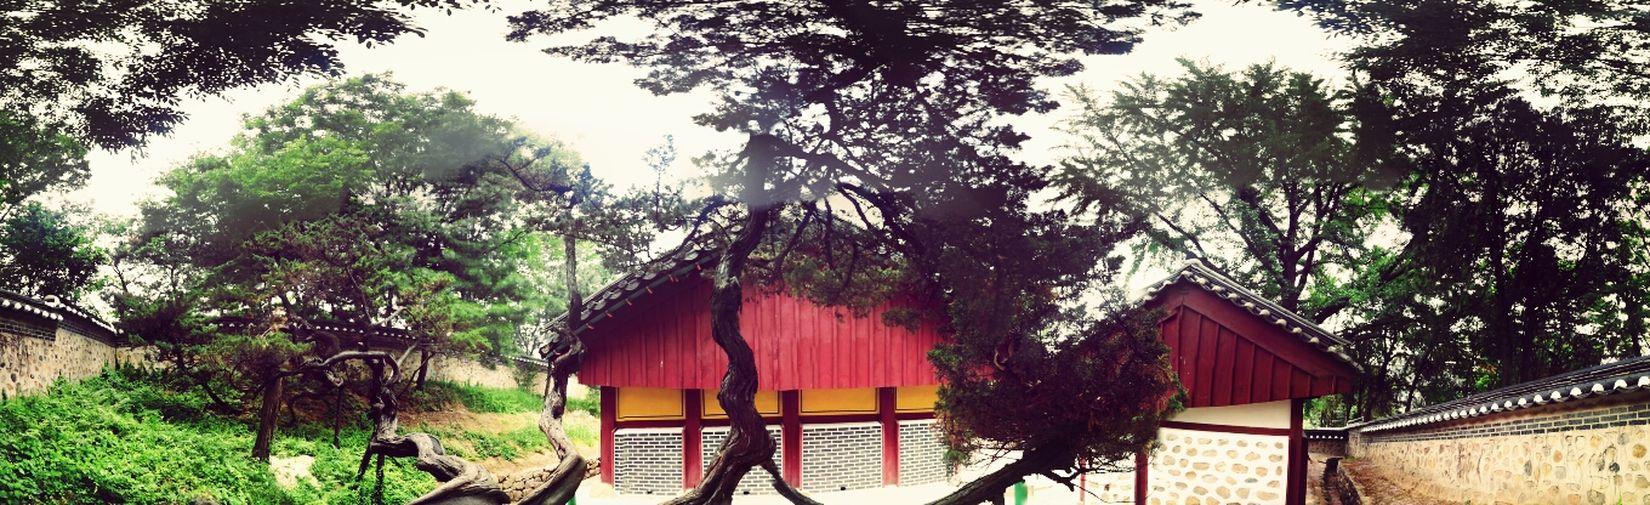 Amezing Tree~~ 구부러진 나무가 매력적인 전통 학교 Nature 건축의 미